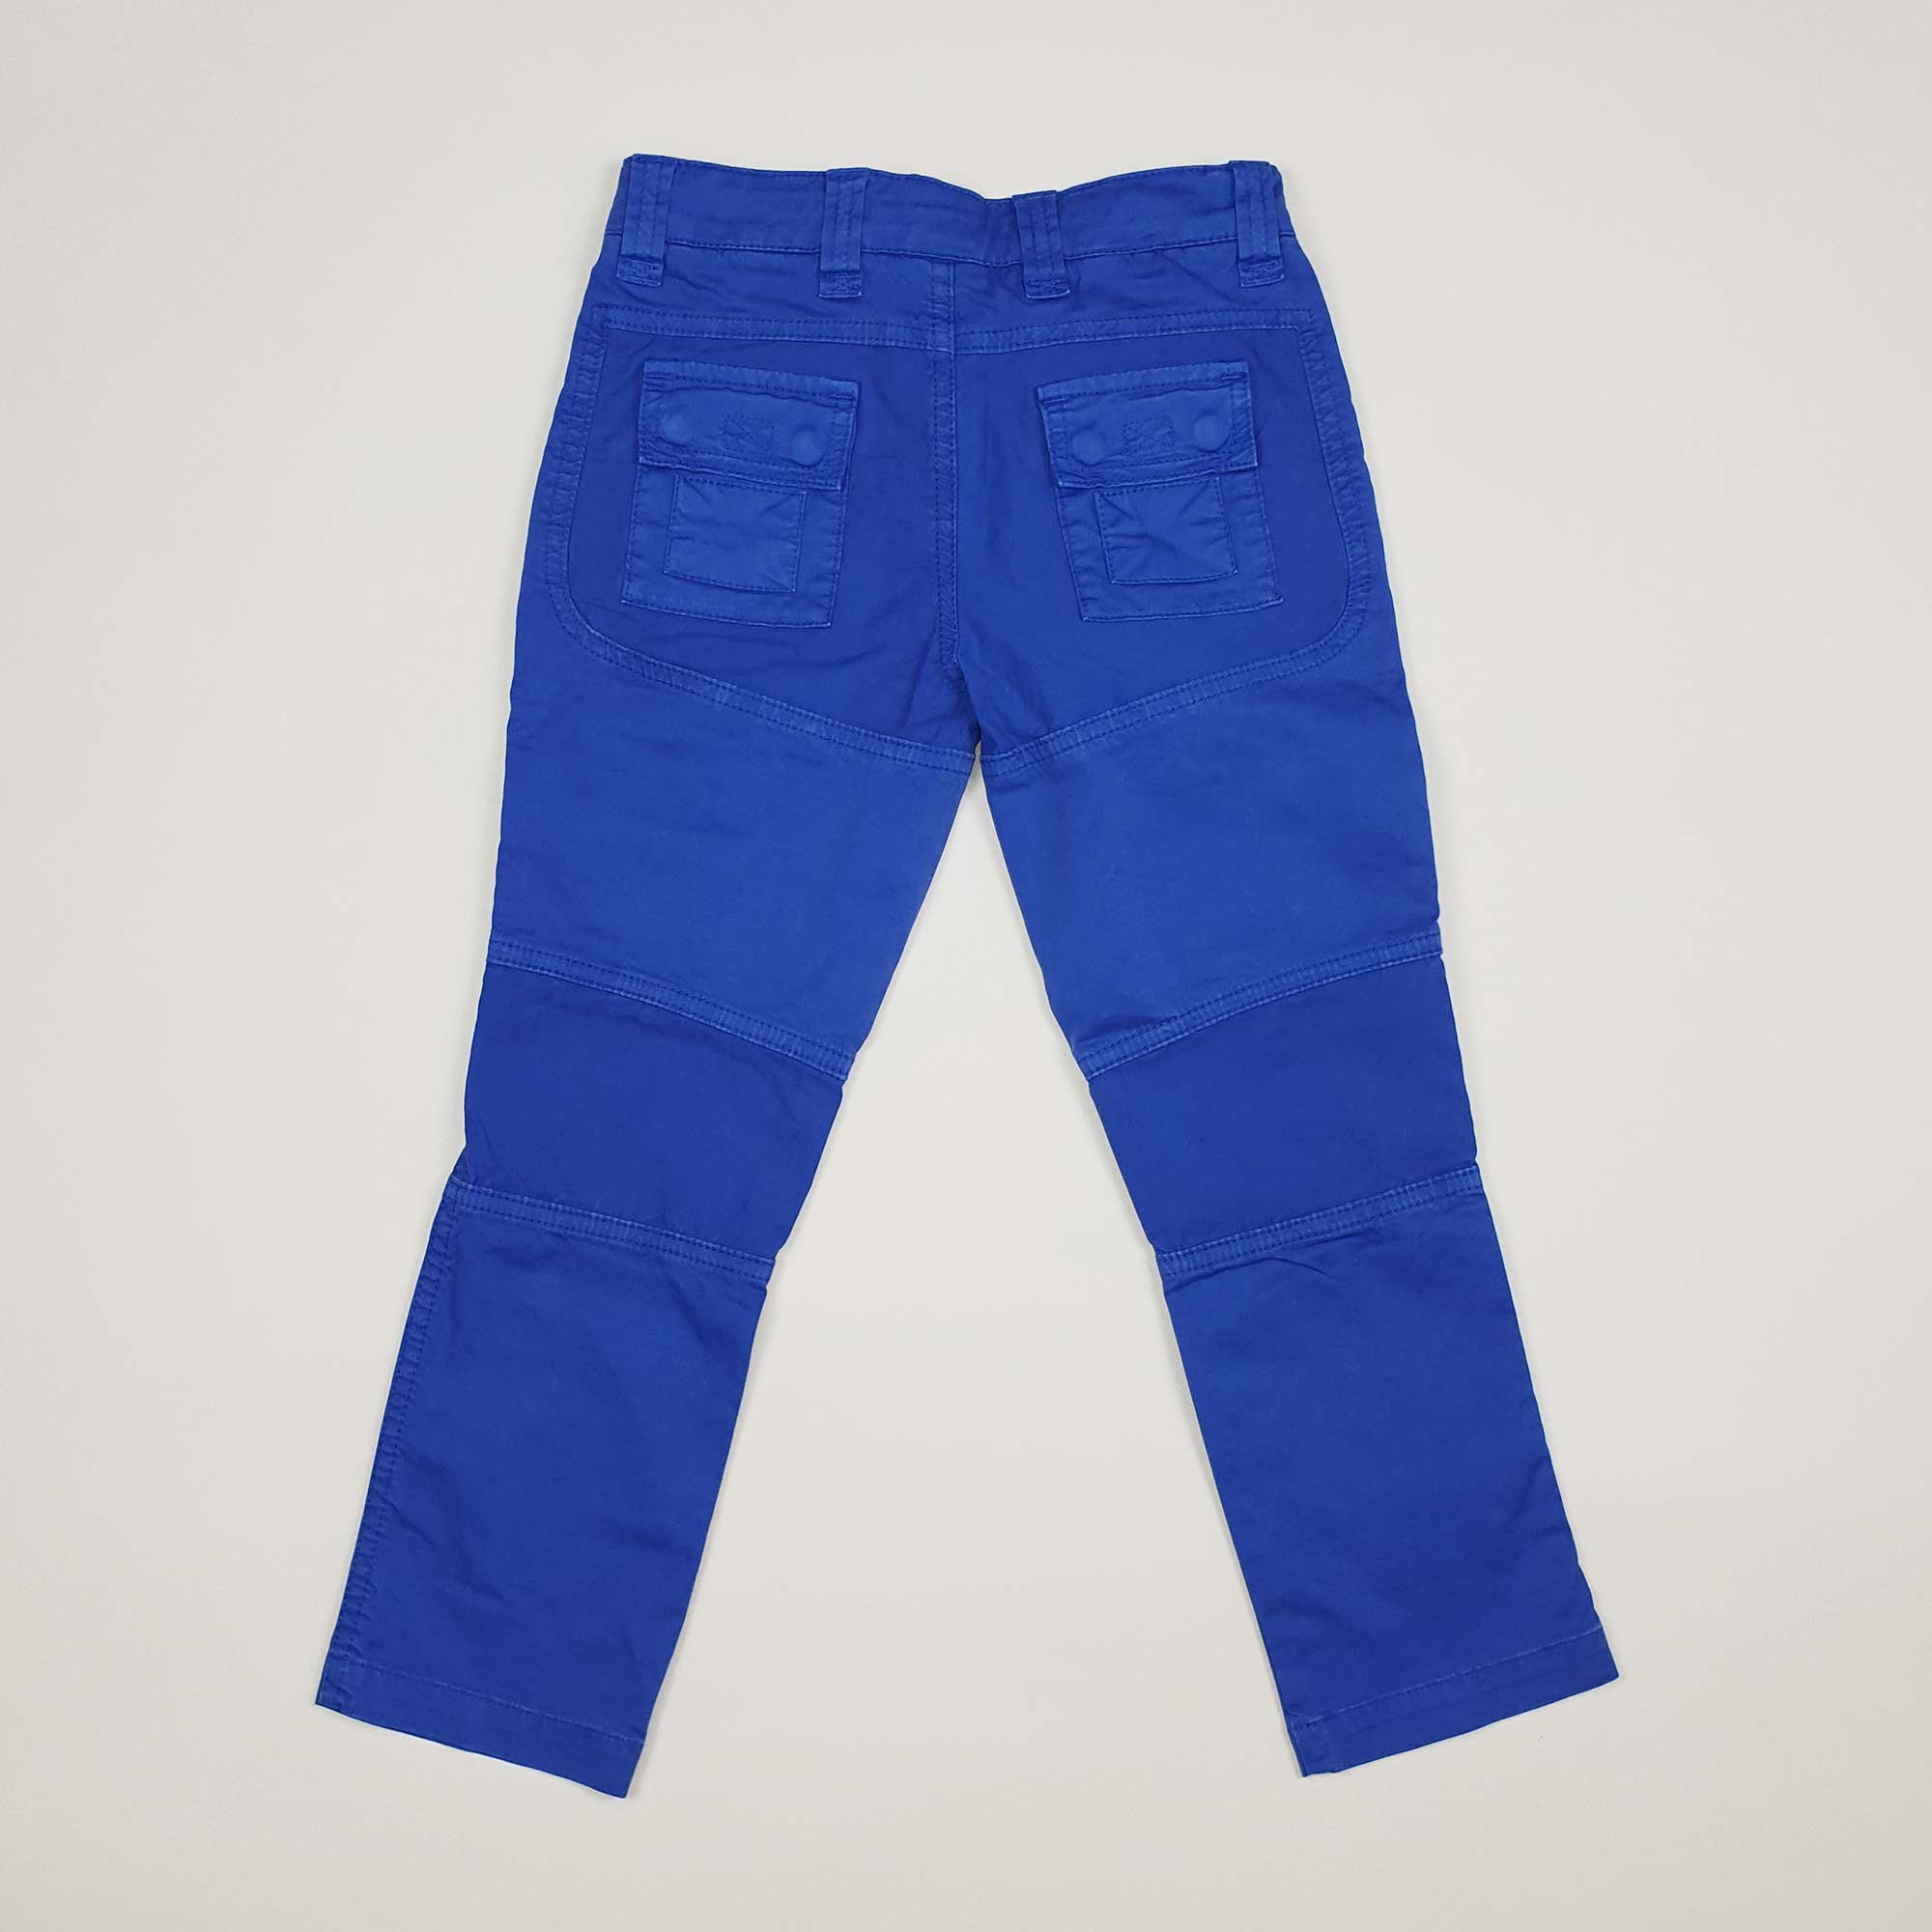 Pantalone anti-g - Bluette